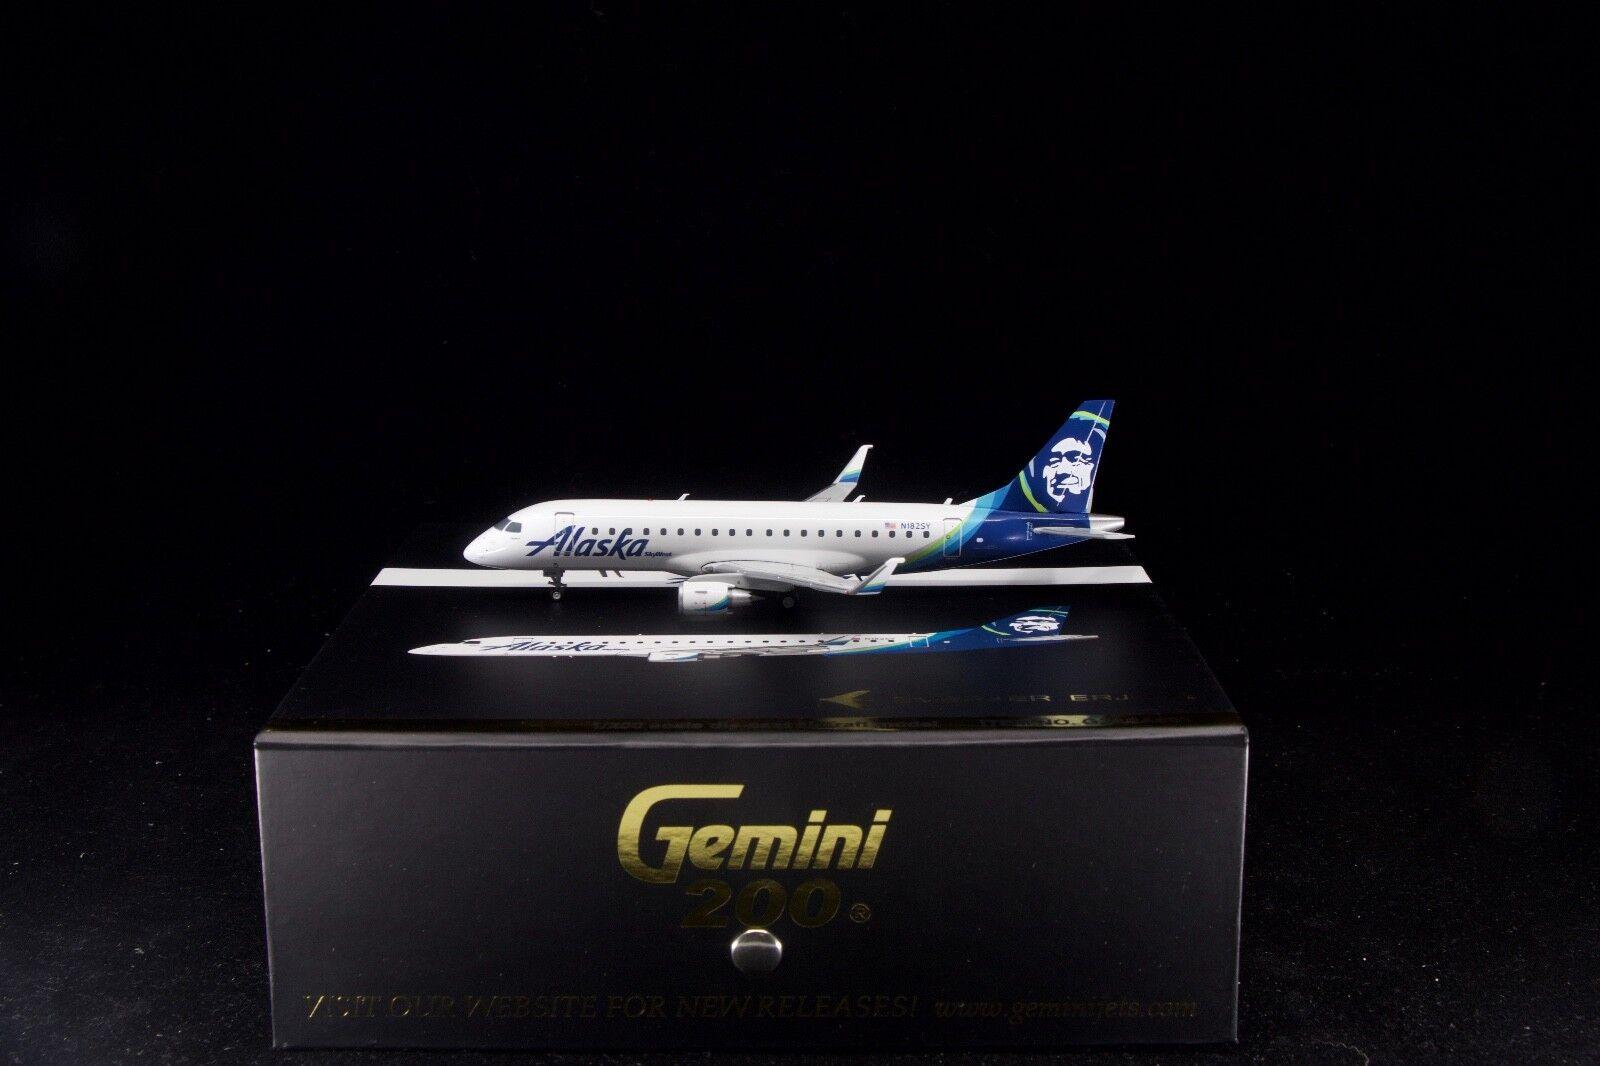 Gemini jets 1   200 alaska airlines erj-175 n182sy